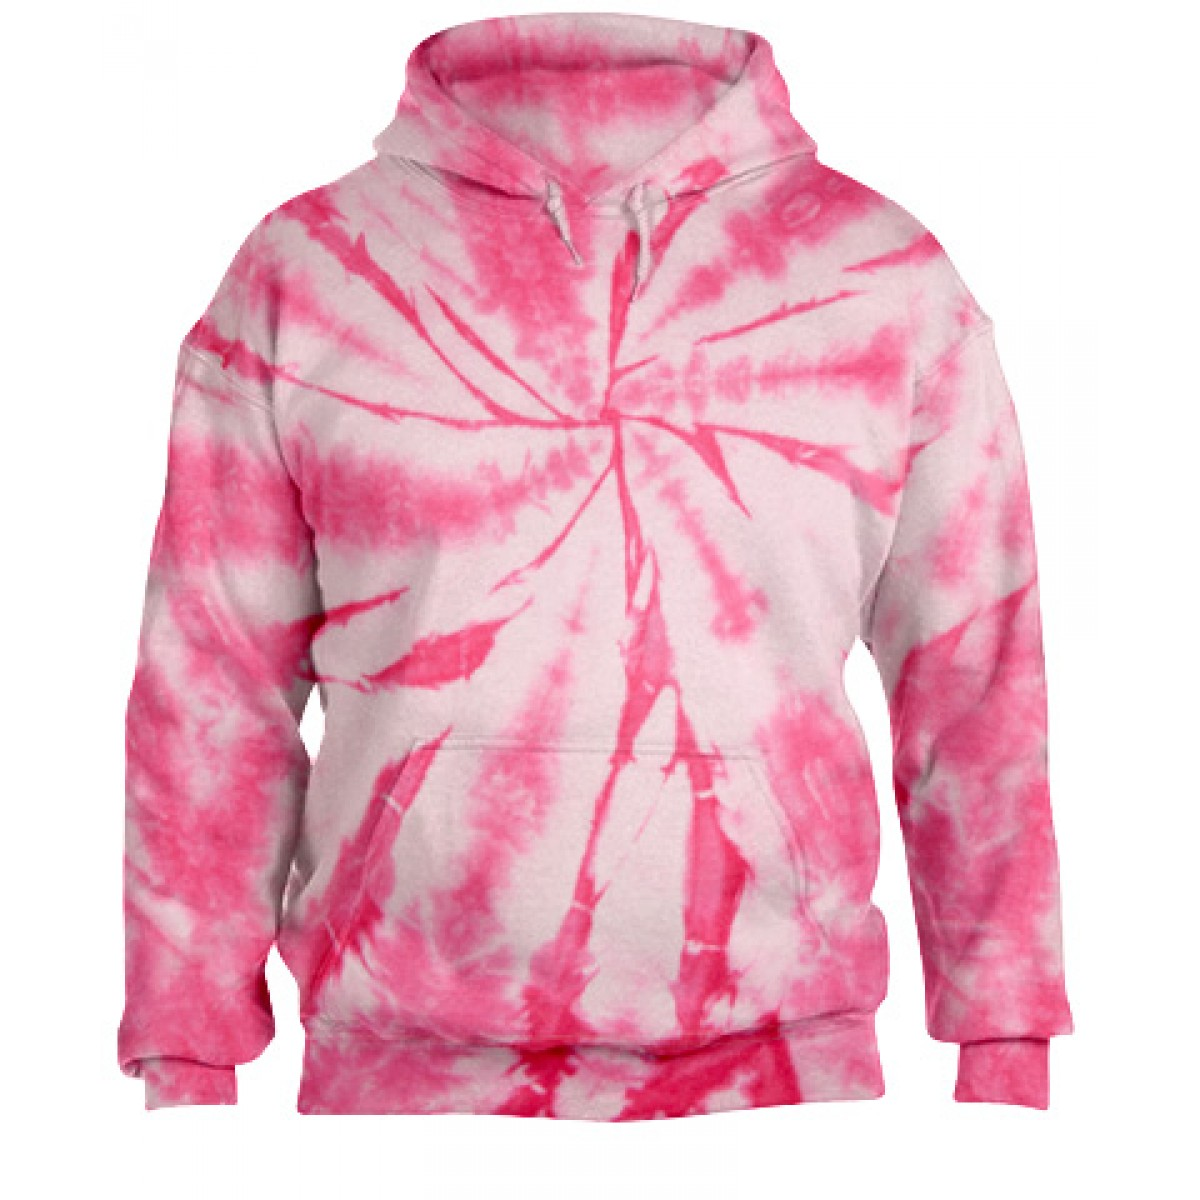 Tie-Dye Pullover Hooded Sweatshirt-Pink-2XL